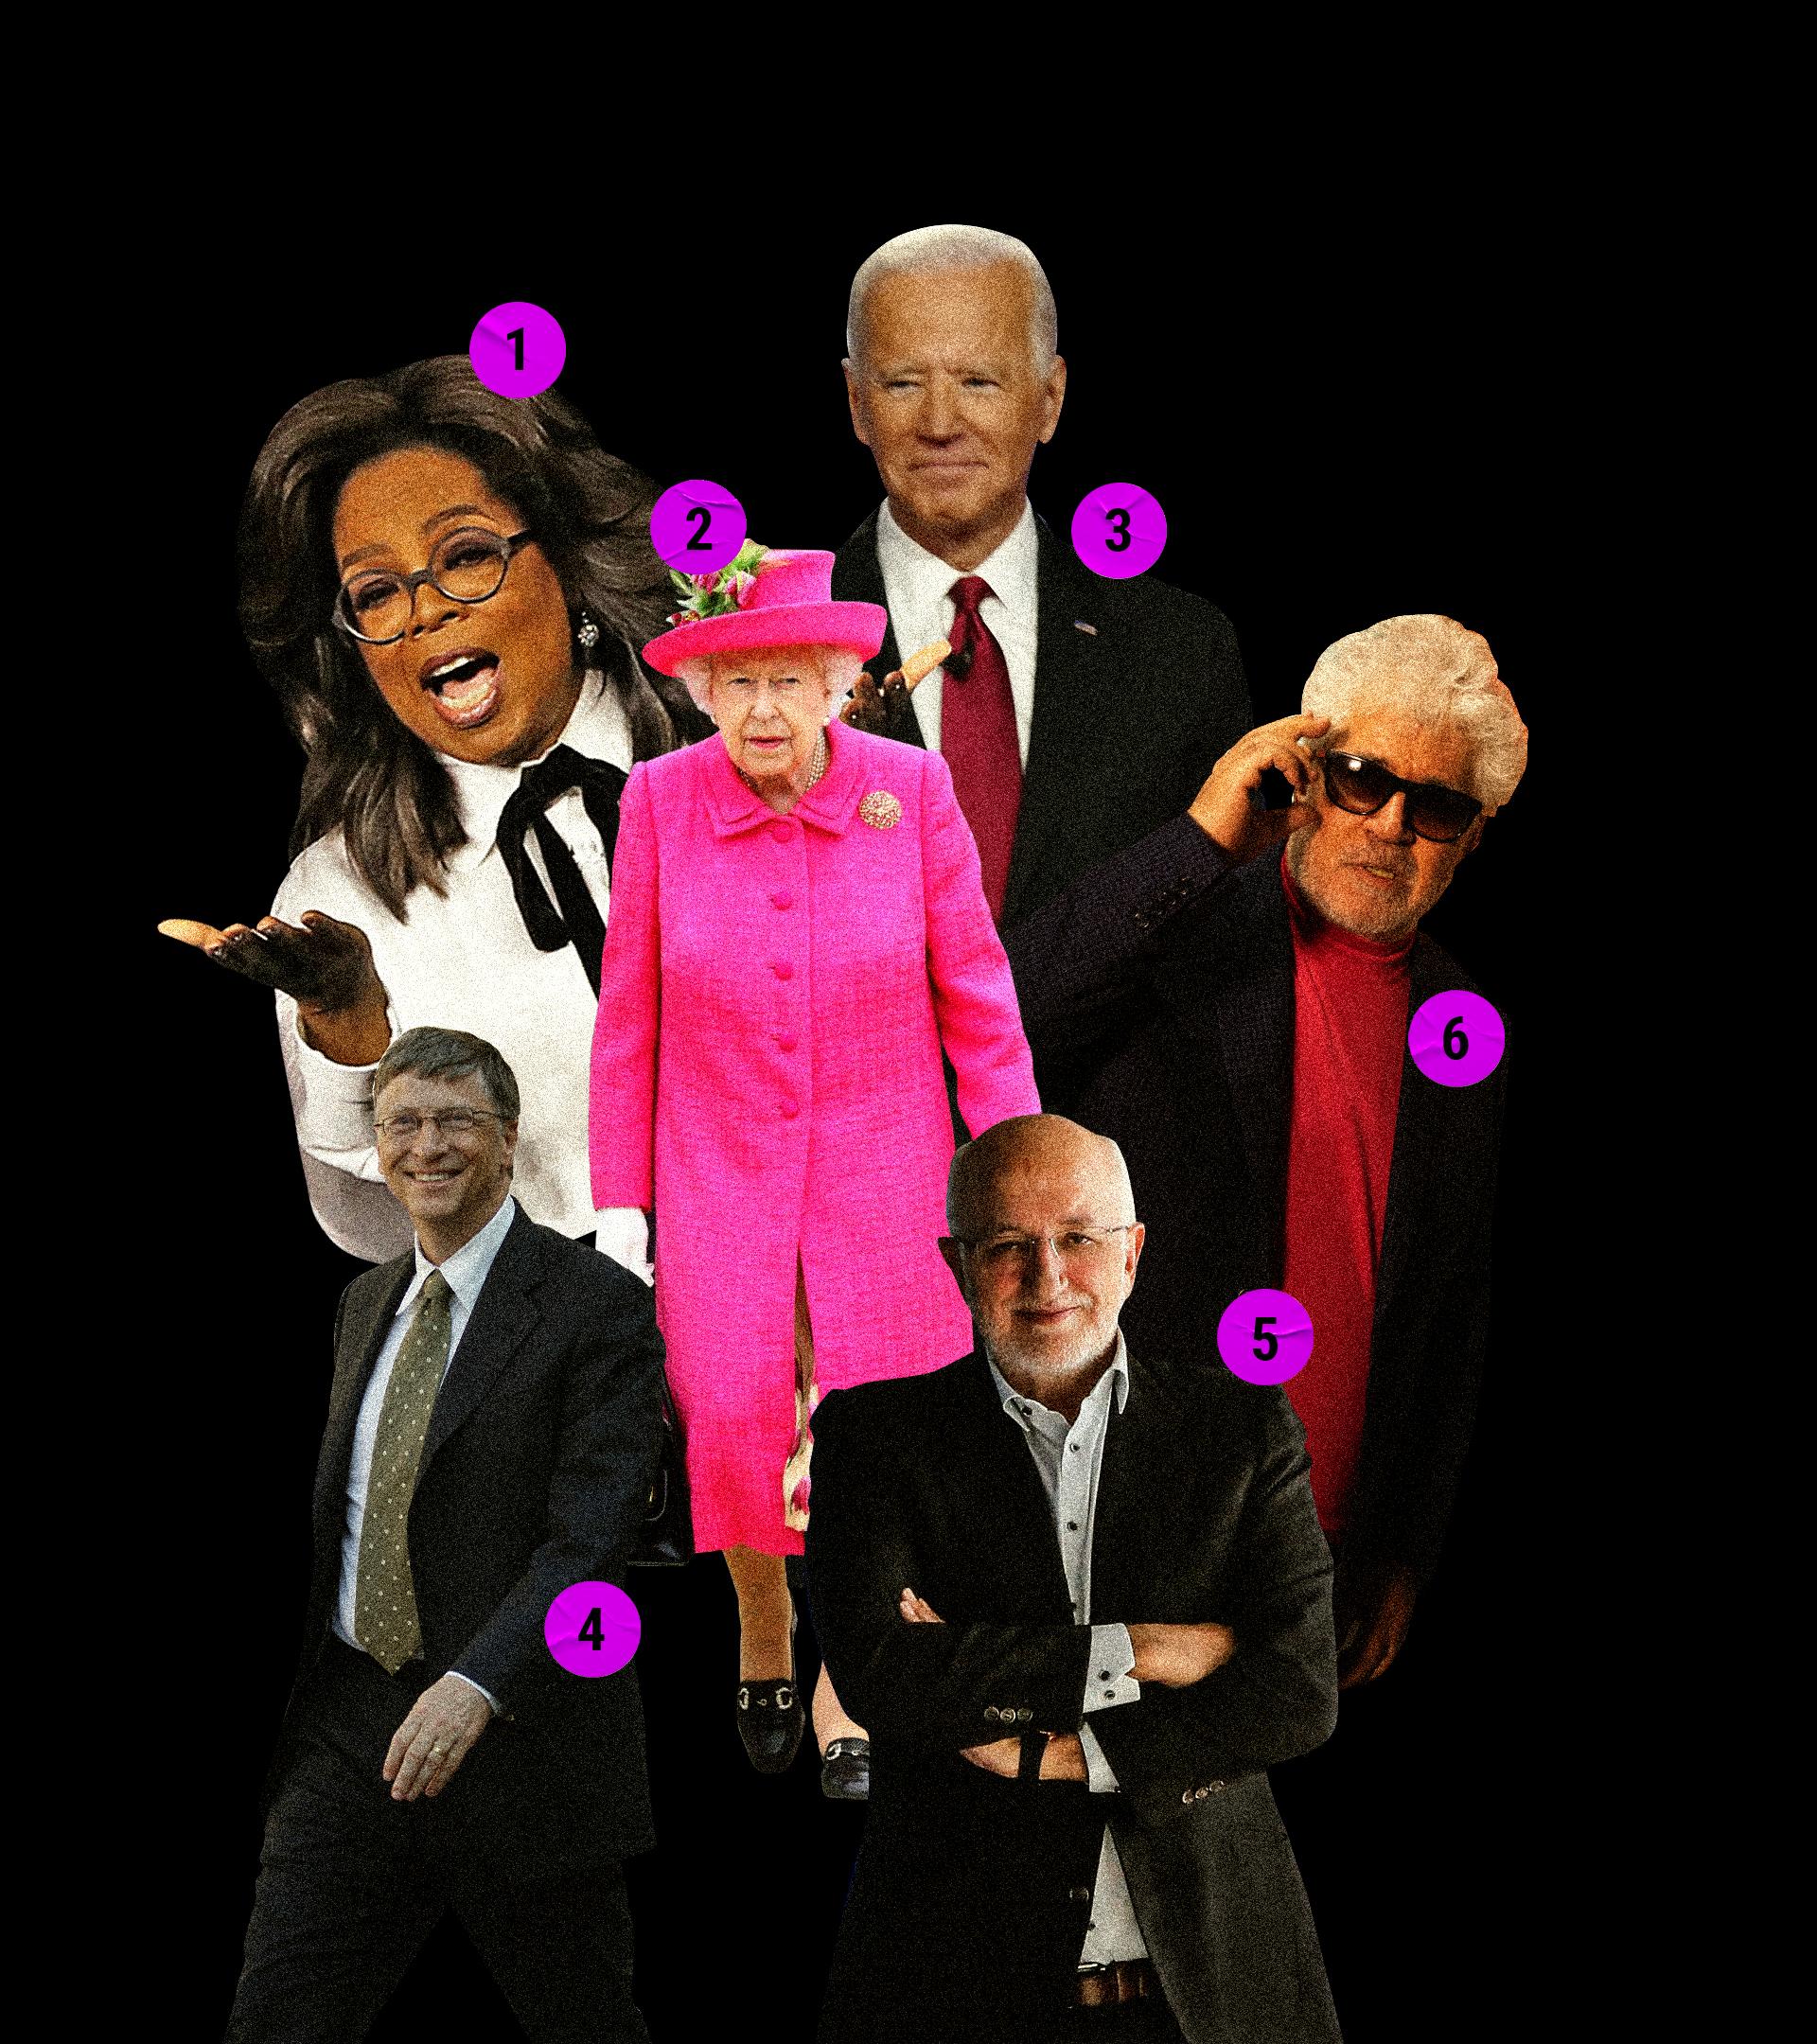 1. Oprah Winfrey 2. Isabel II 3. Joe Biden 4. Bill Gates 5. Juan Roig 6. Pedro Almodóvar